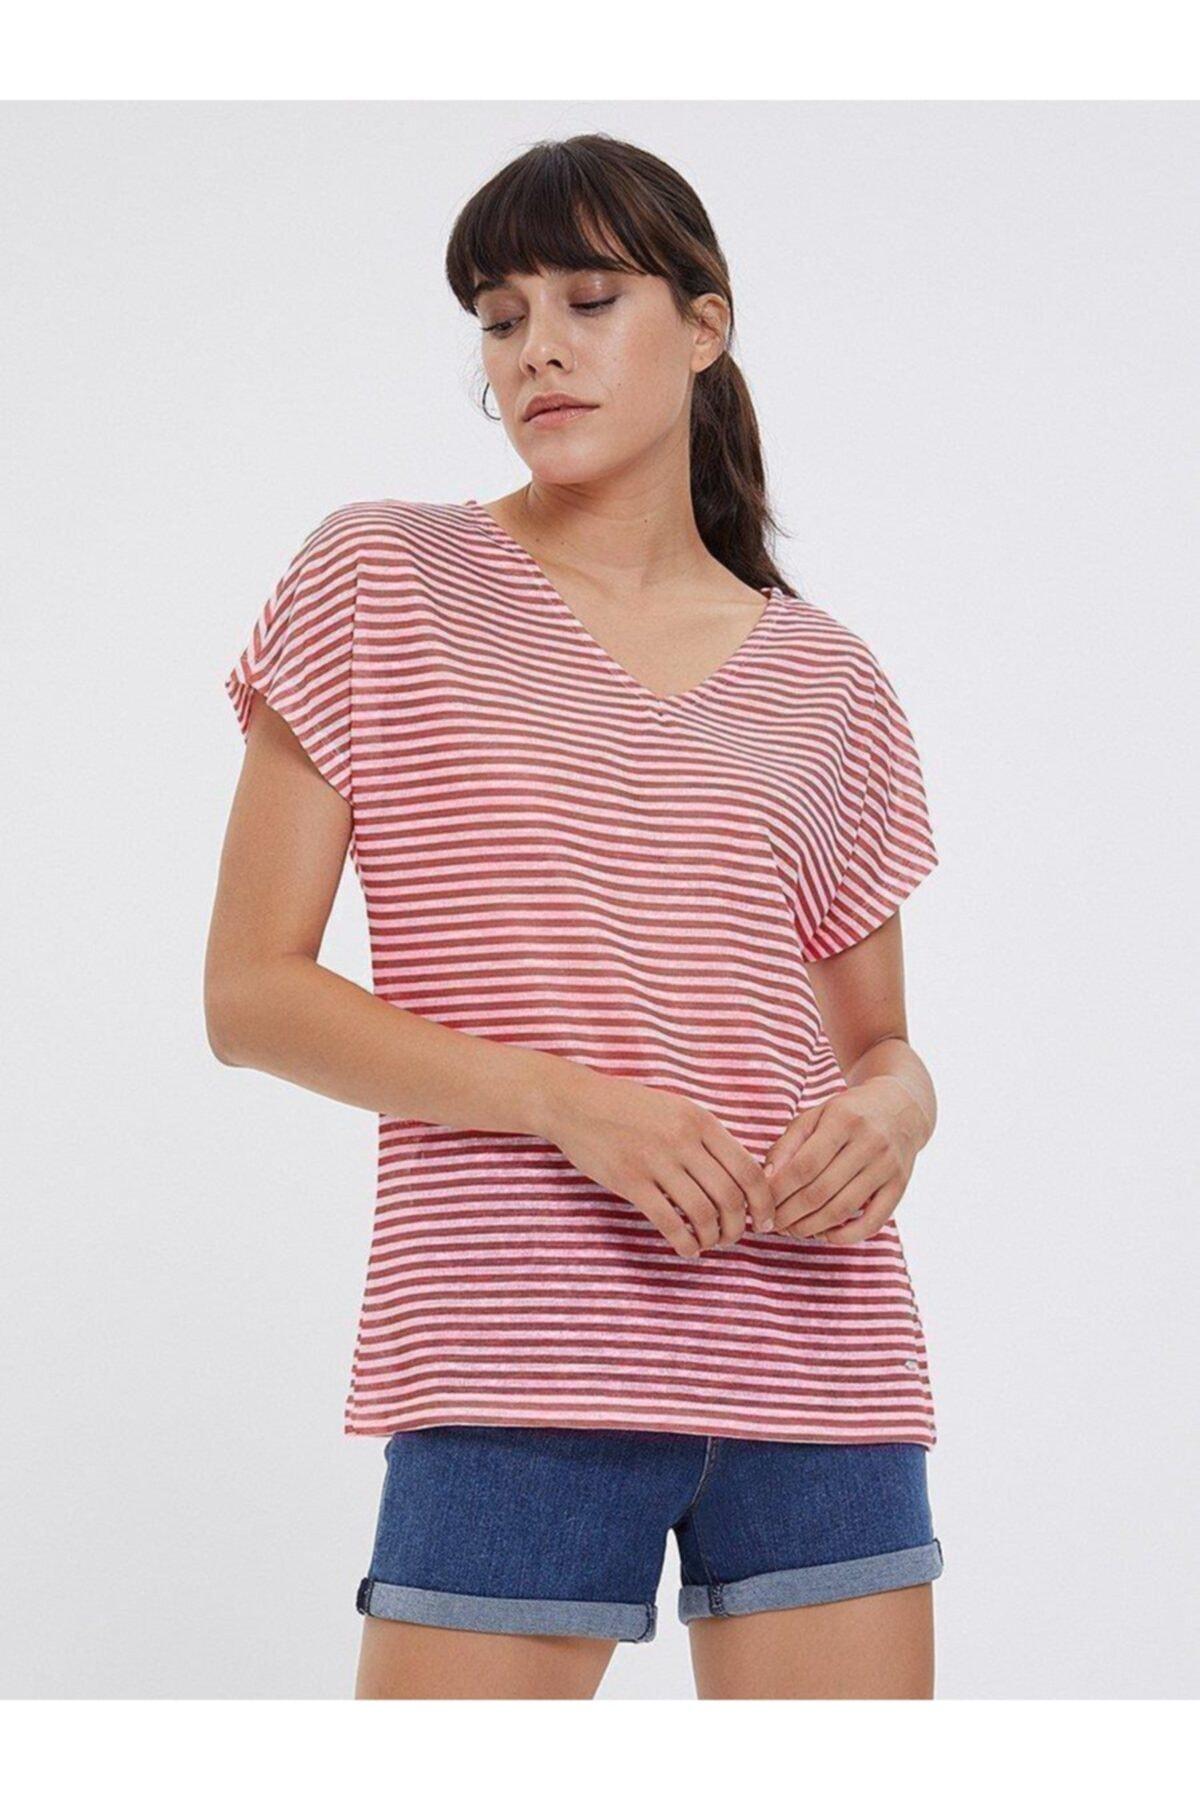 Loft Regular Fit Kadın Tshirt Kısa Kol T-shırt 1